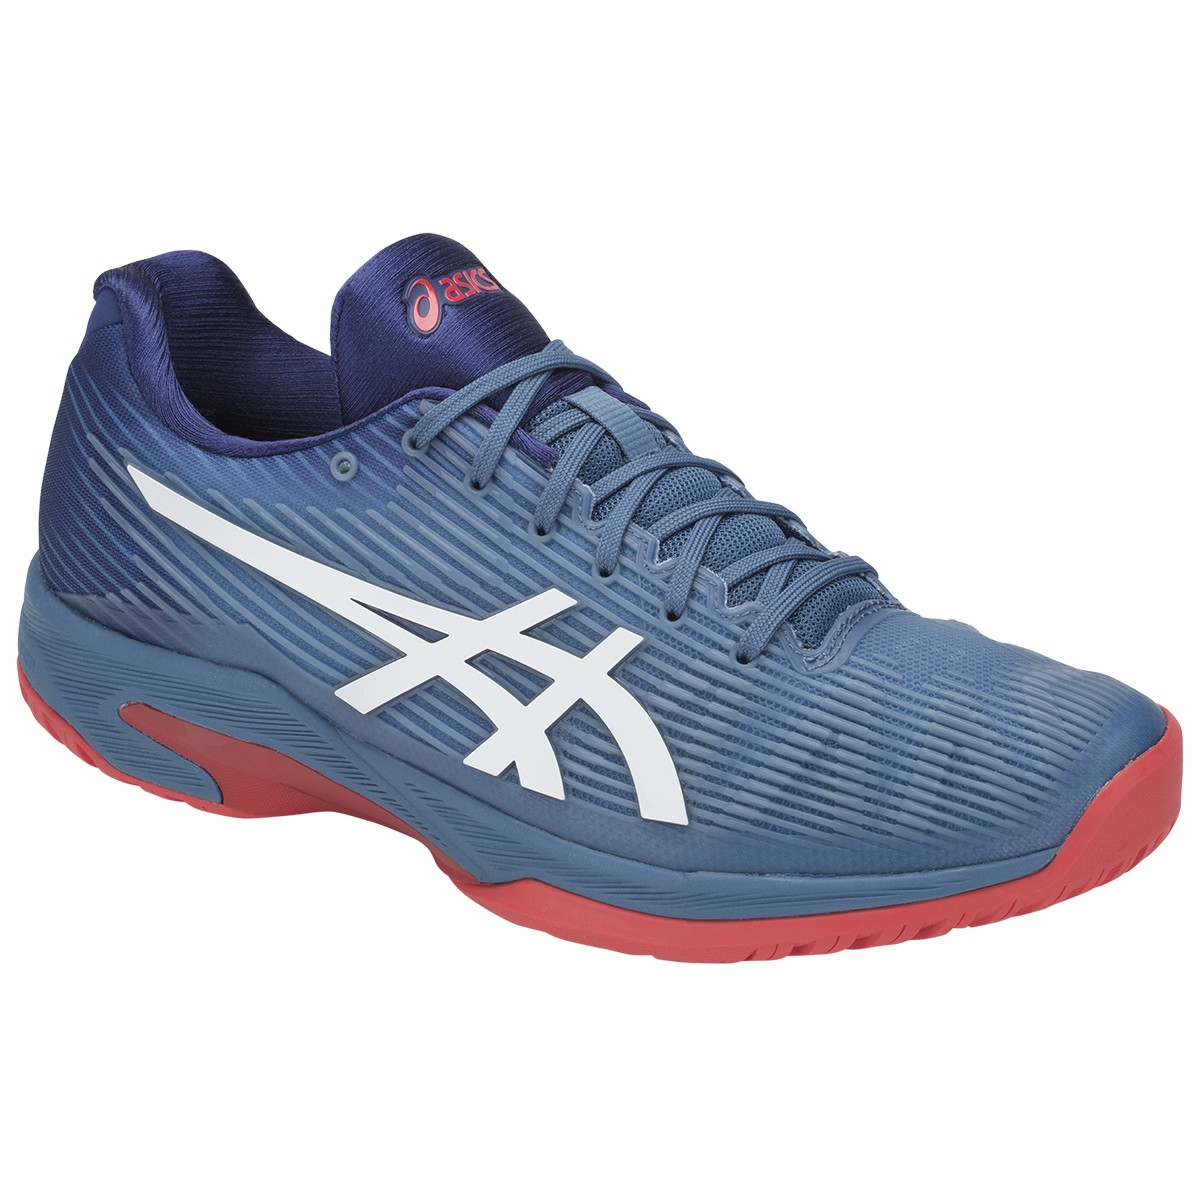 Soldes > chaussure tennis asics > en stock